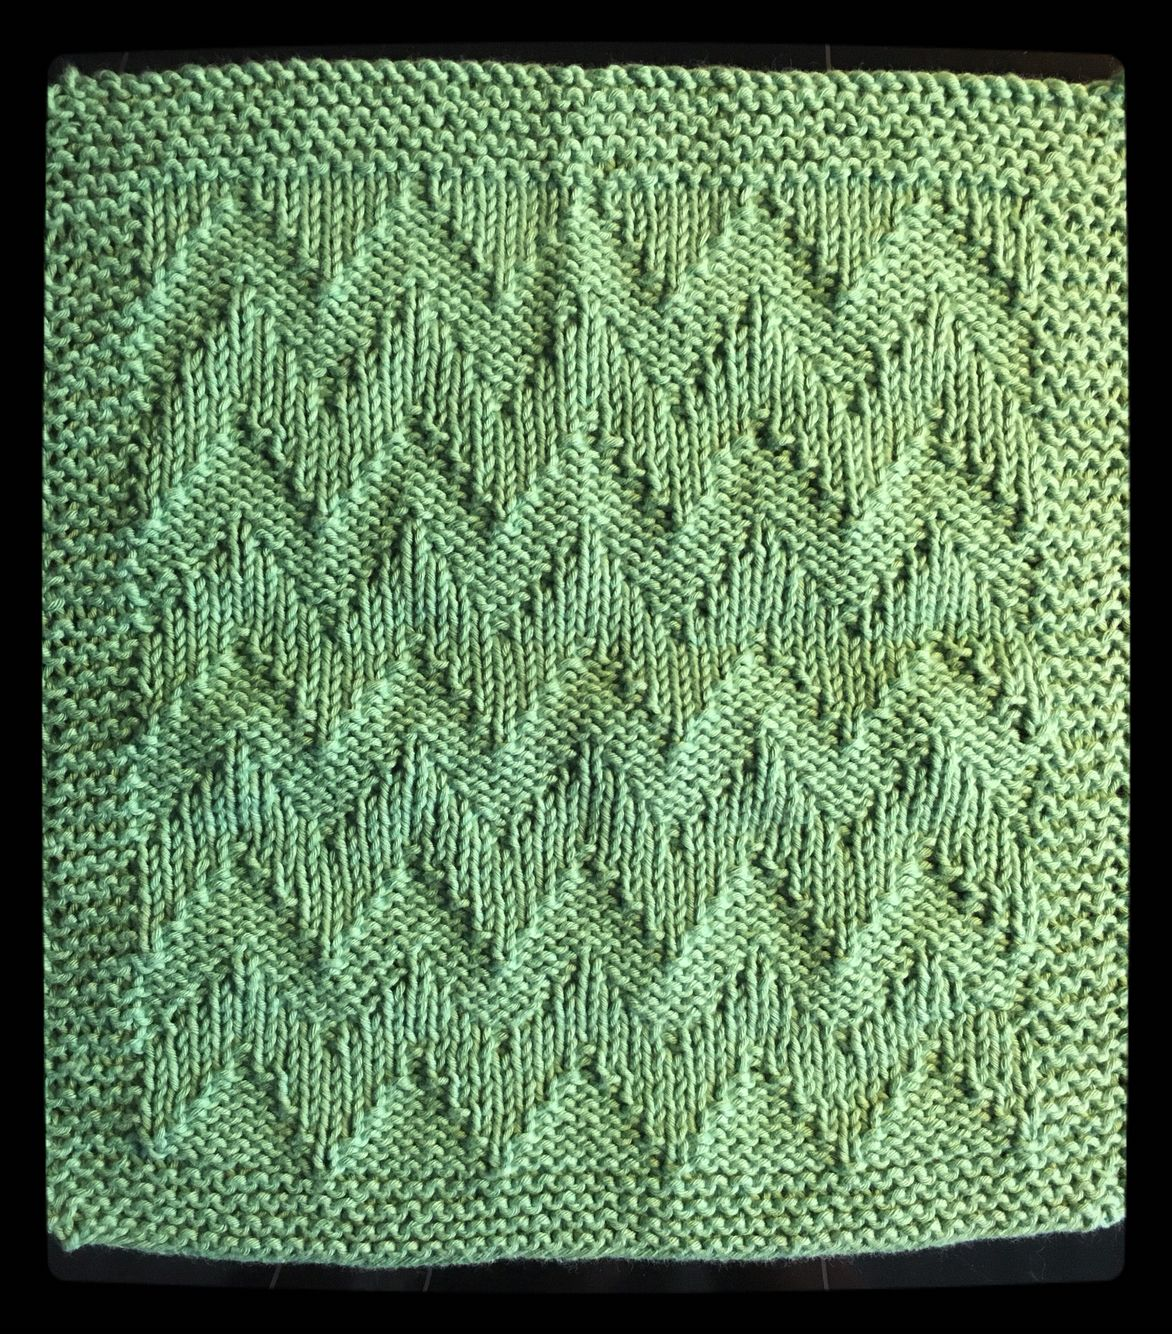 Dishcloth - karklud med zig-zag mønster i økologisk bomuld.